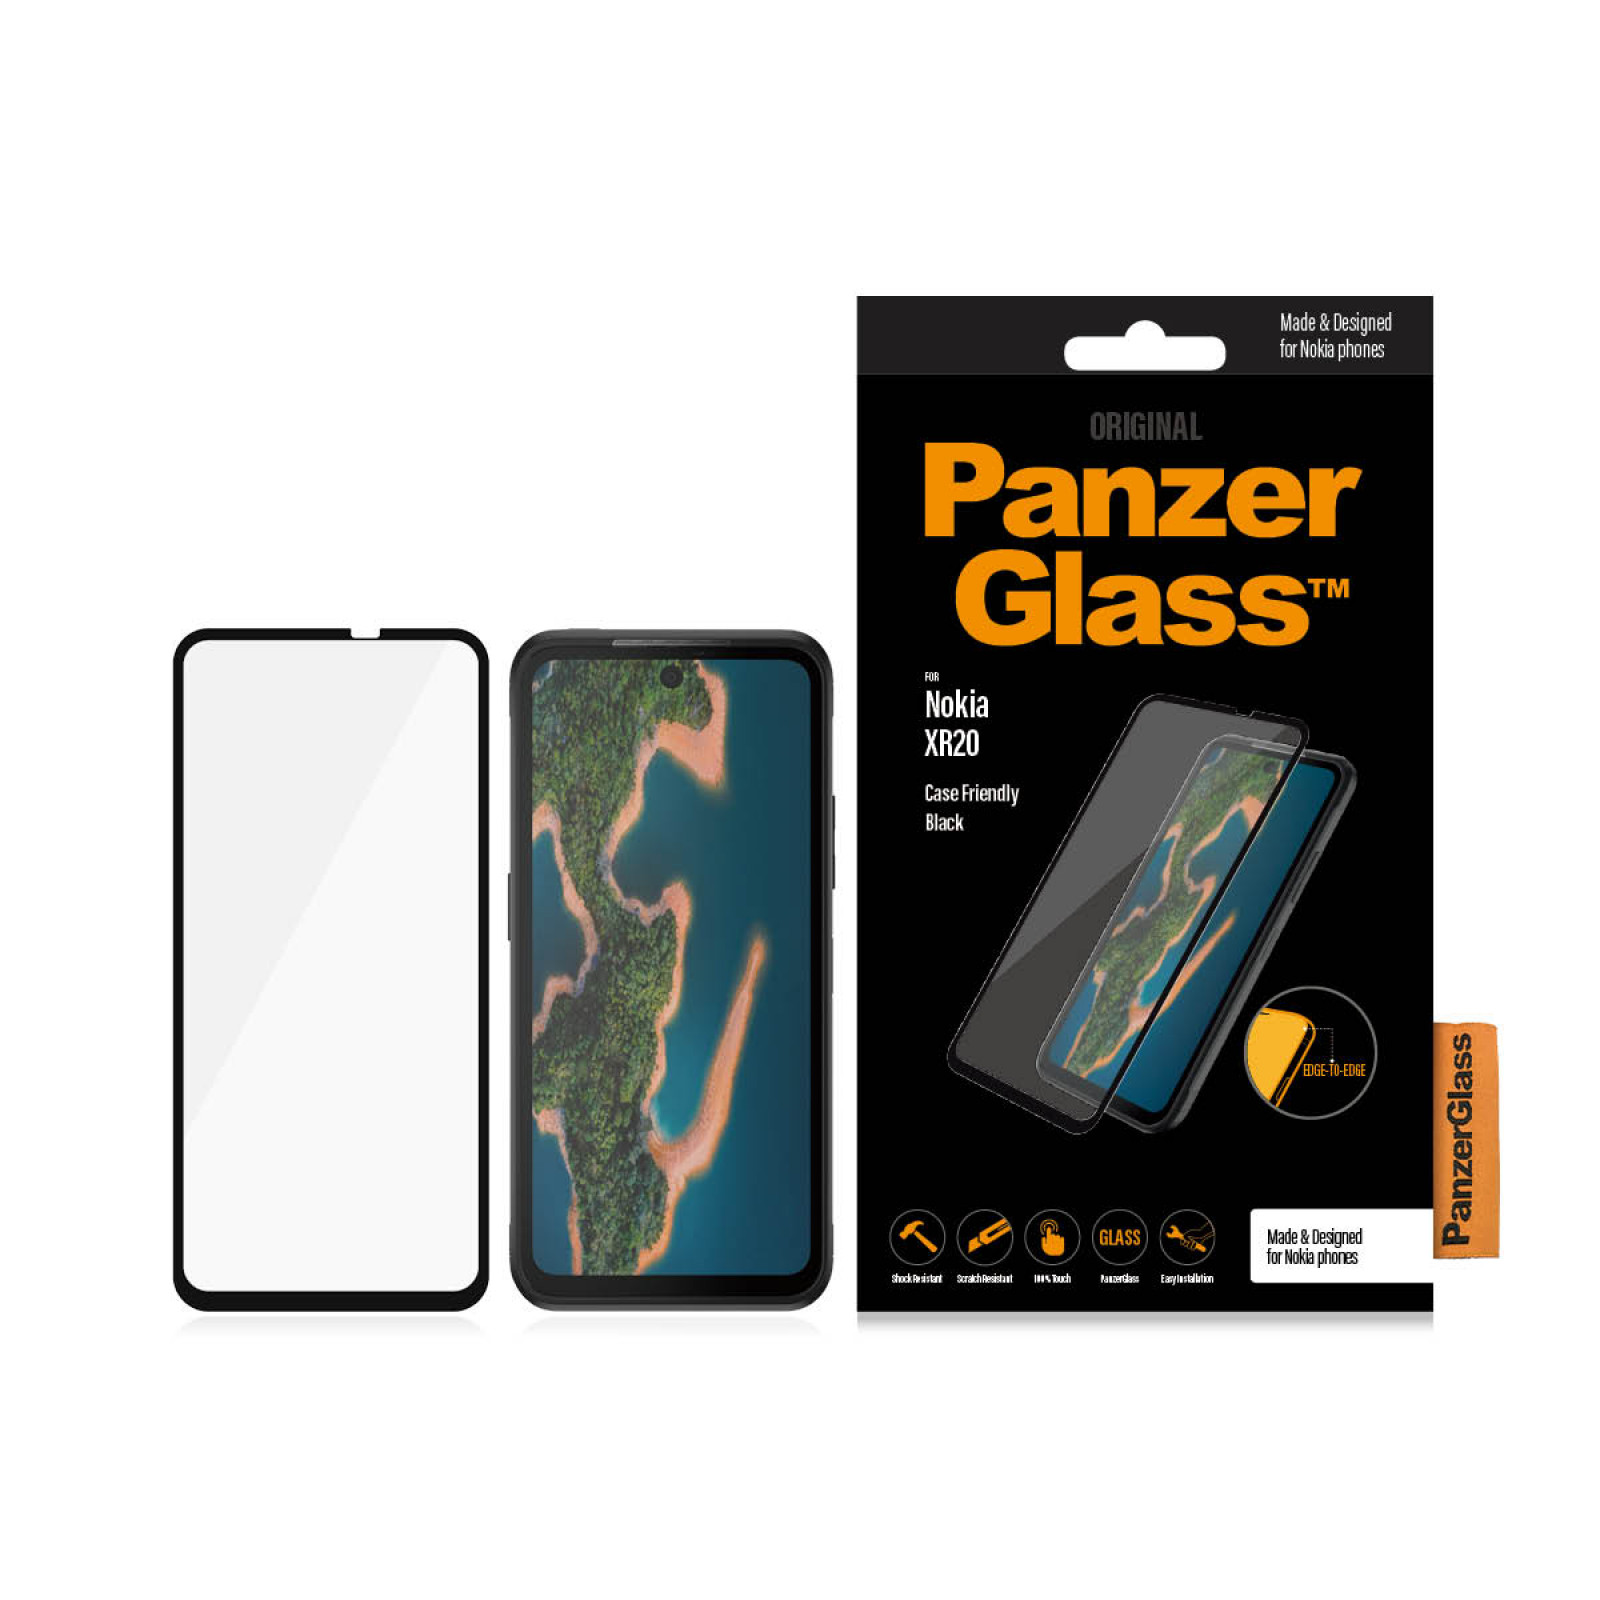 Стъклен протектор PanzerGlass за Nokia XR20 CaseFriendly - Черен